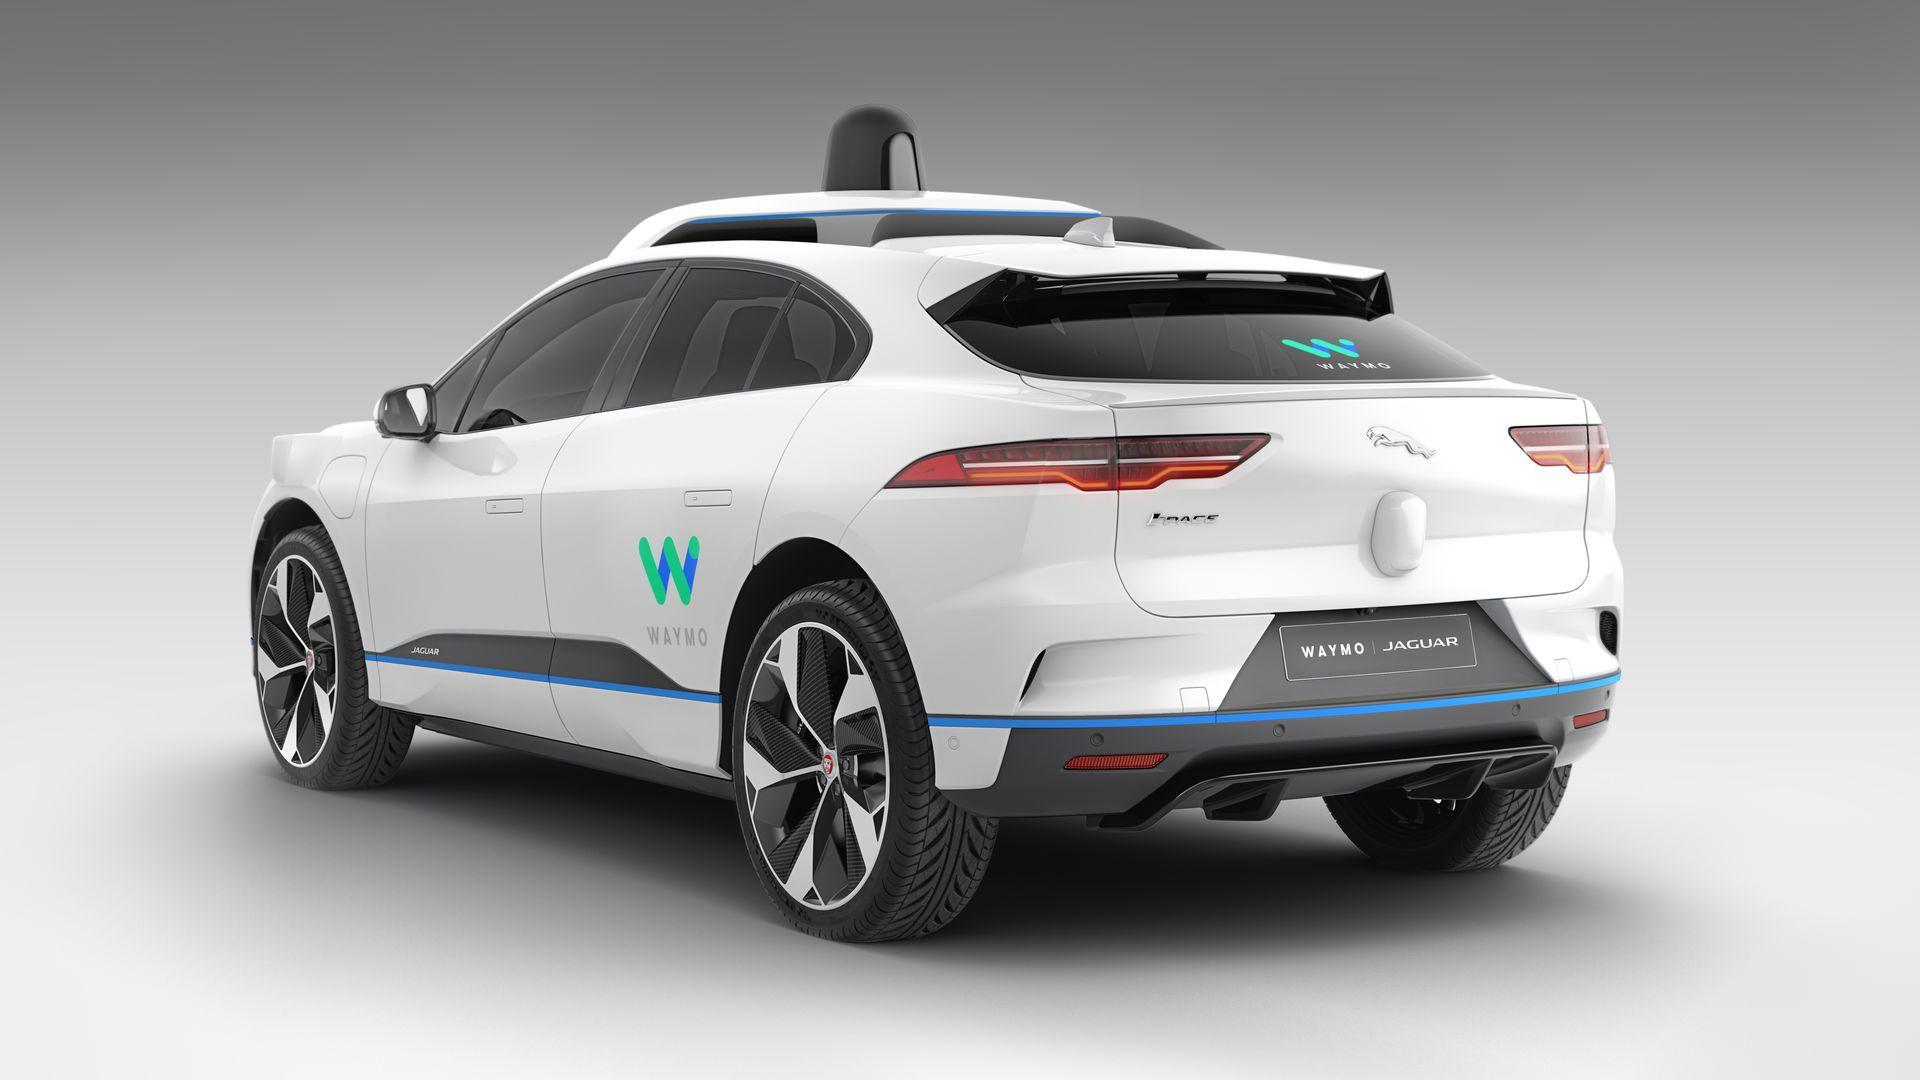 Waymo's new self-driving EV